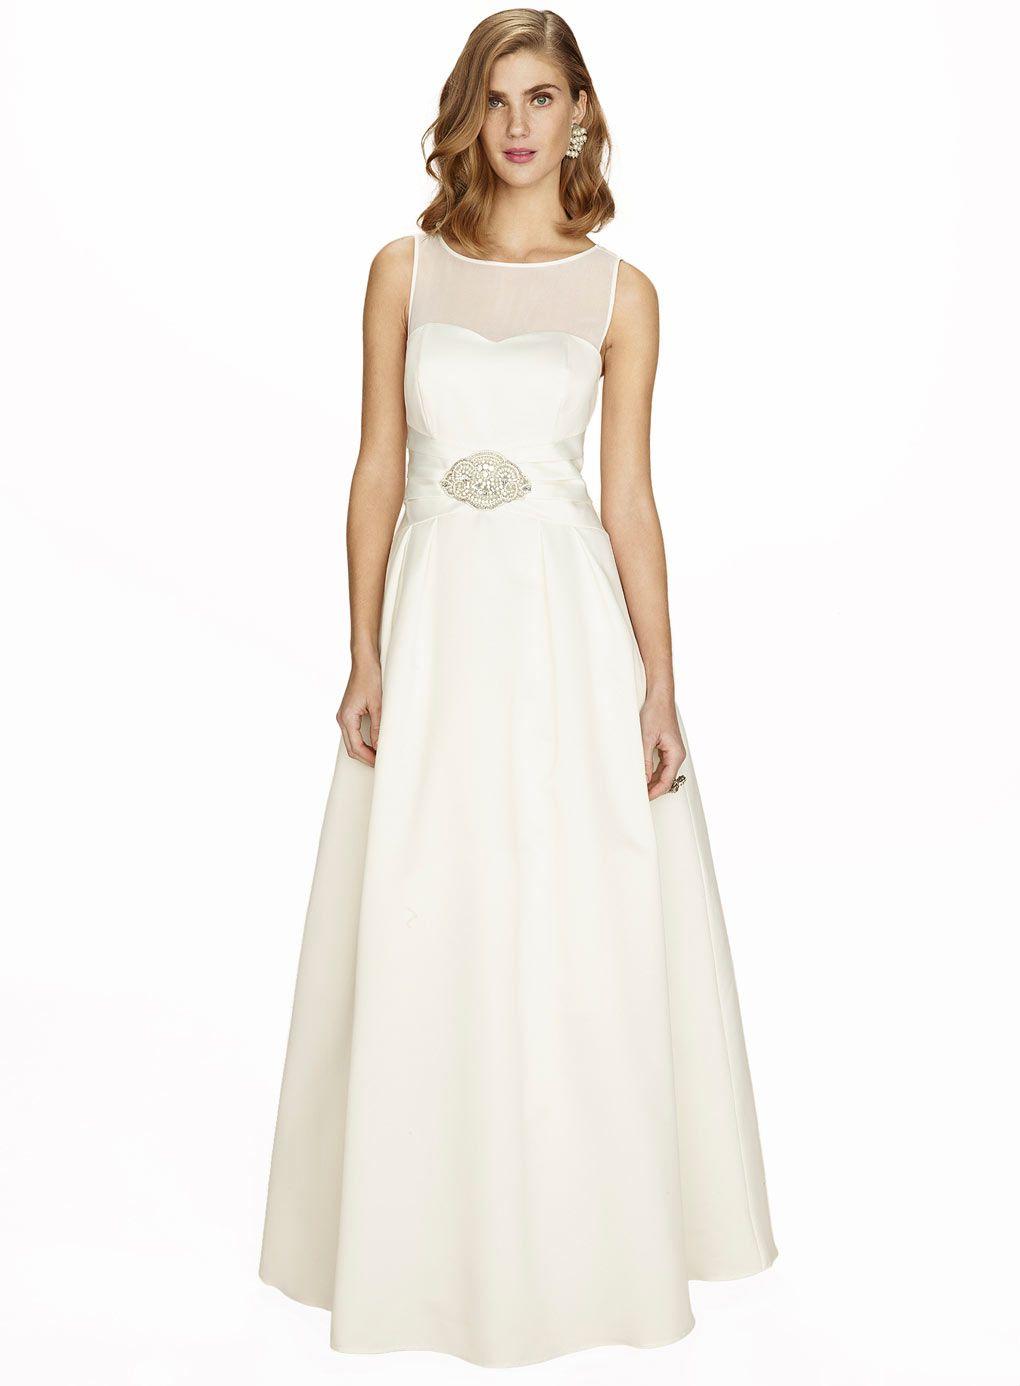 Ella bridal dress httpweddingheartbhs wedding ella bridal dress httpweddingheartbhs ombrellifo Choice Image